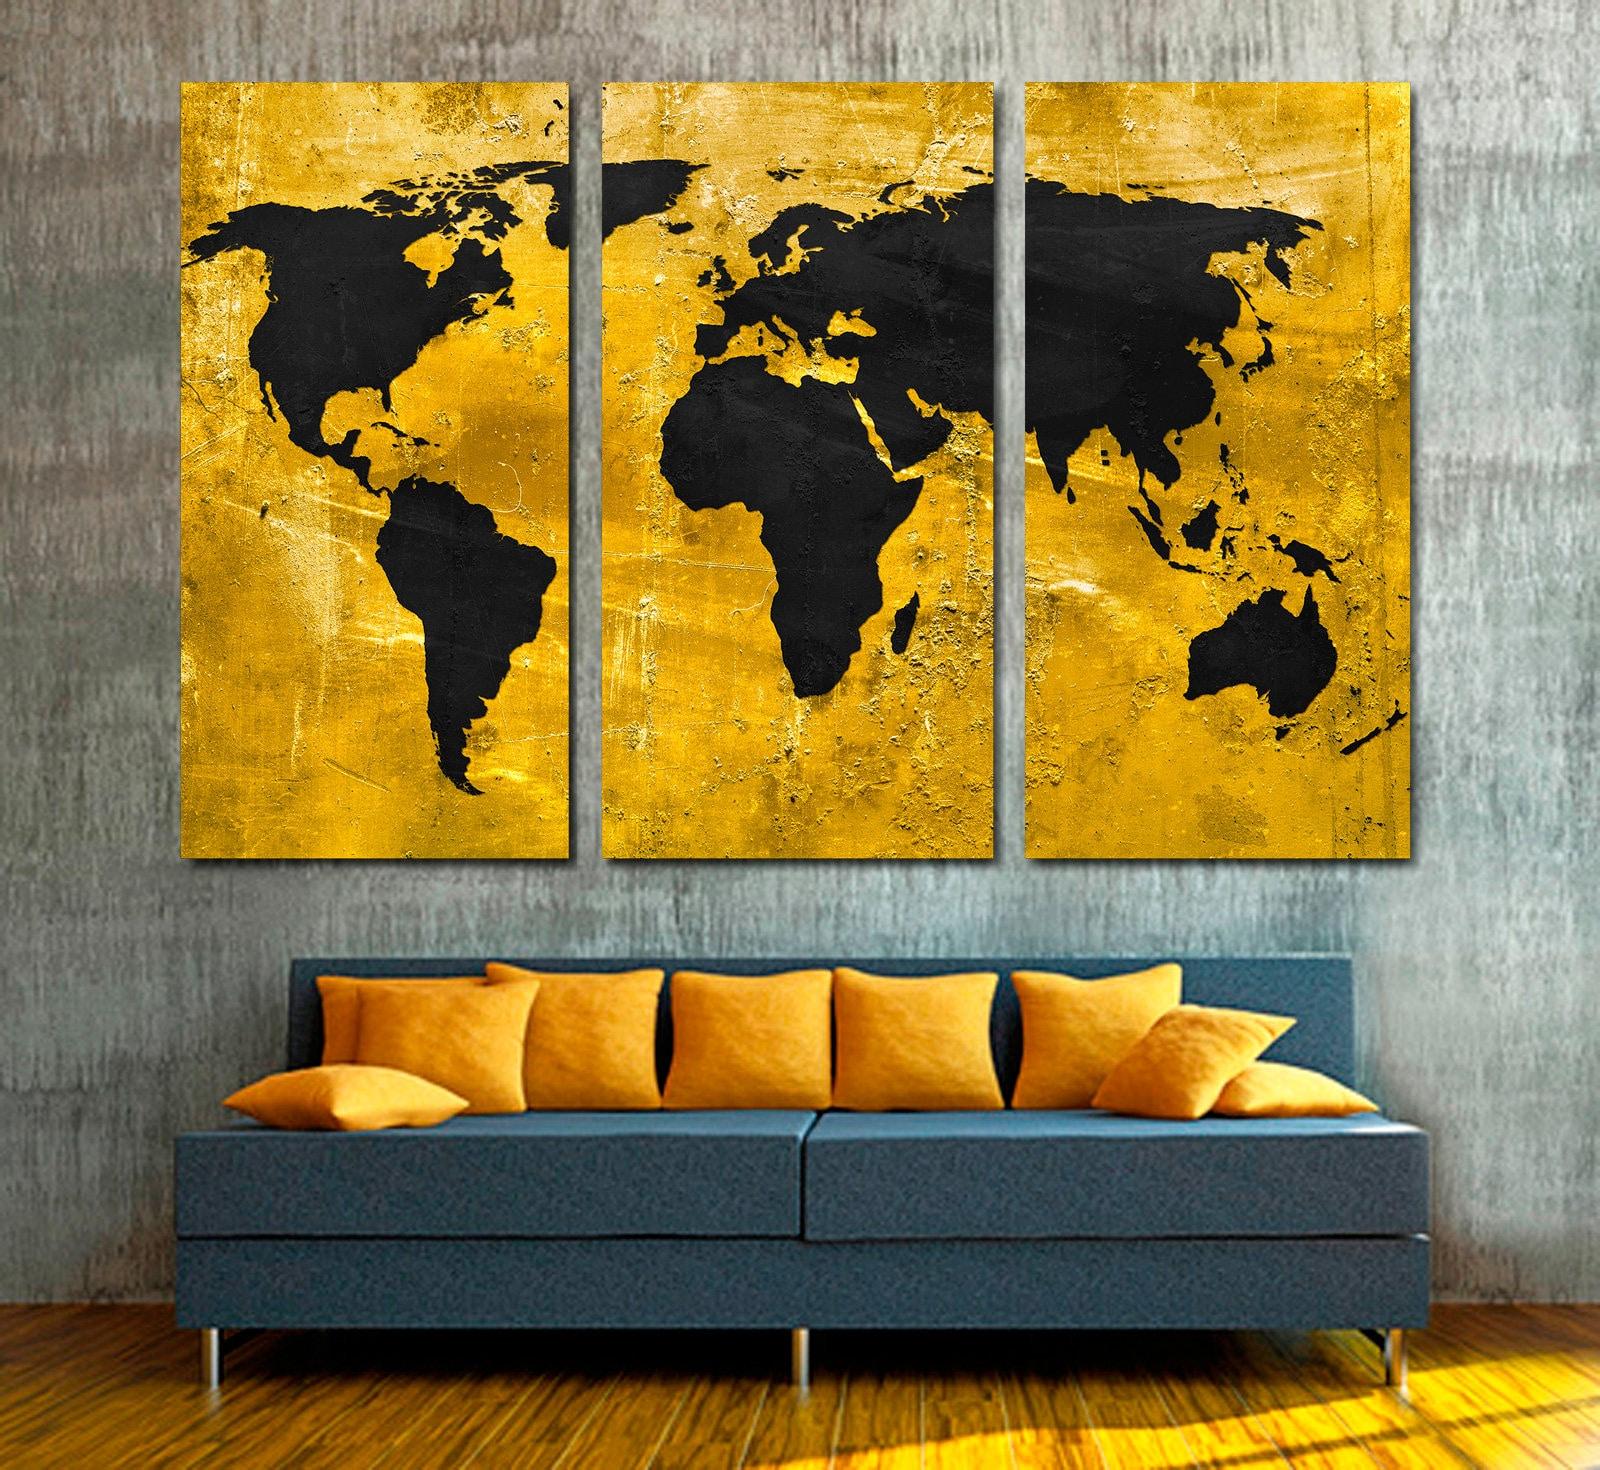 Gold and Black World Map Canvas Print Wall art 3 Panel Split | Etsy